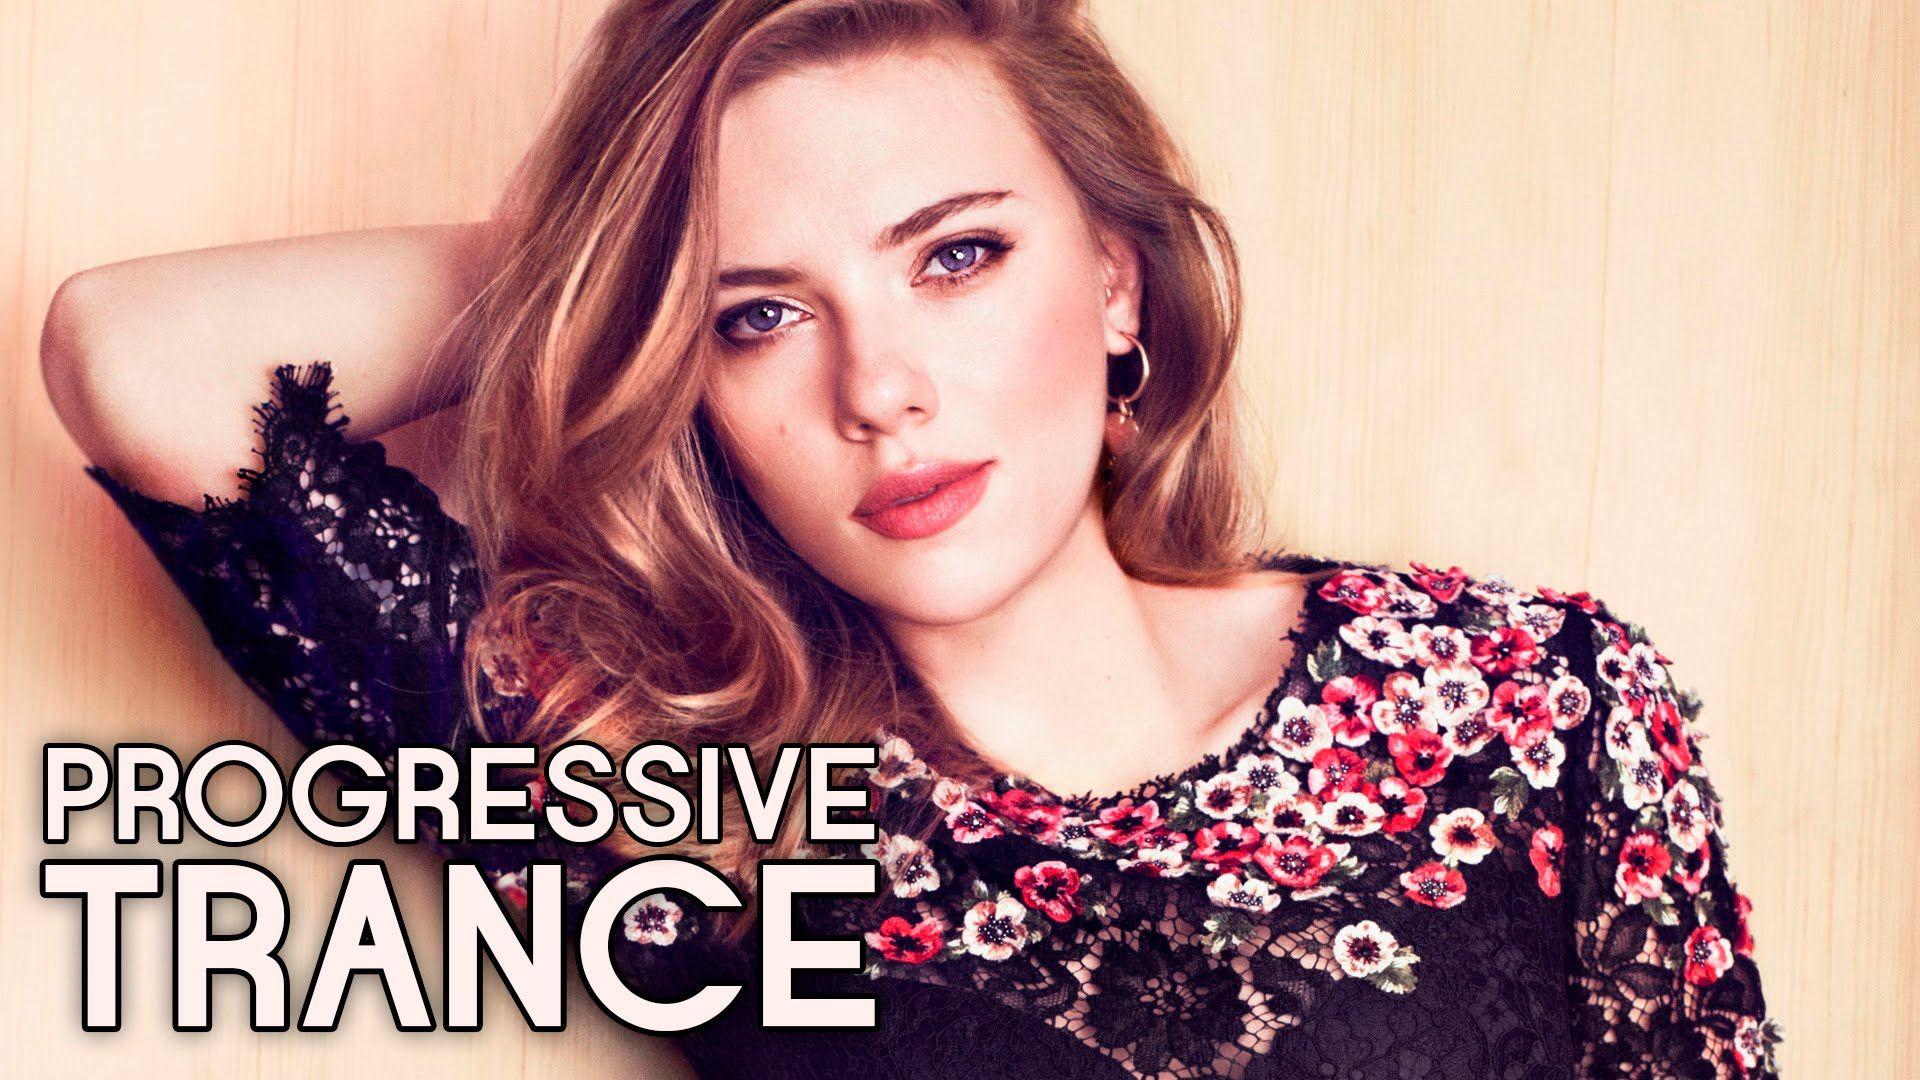 ♫ Progressive Trance Top 10 (June 2016) / New Trance Mix / Paradise